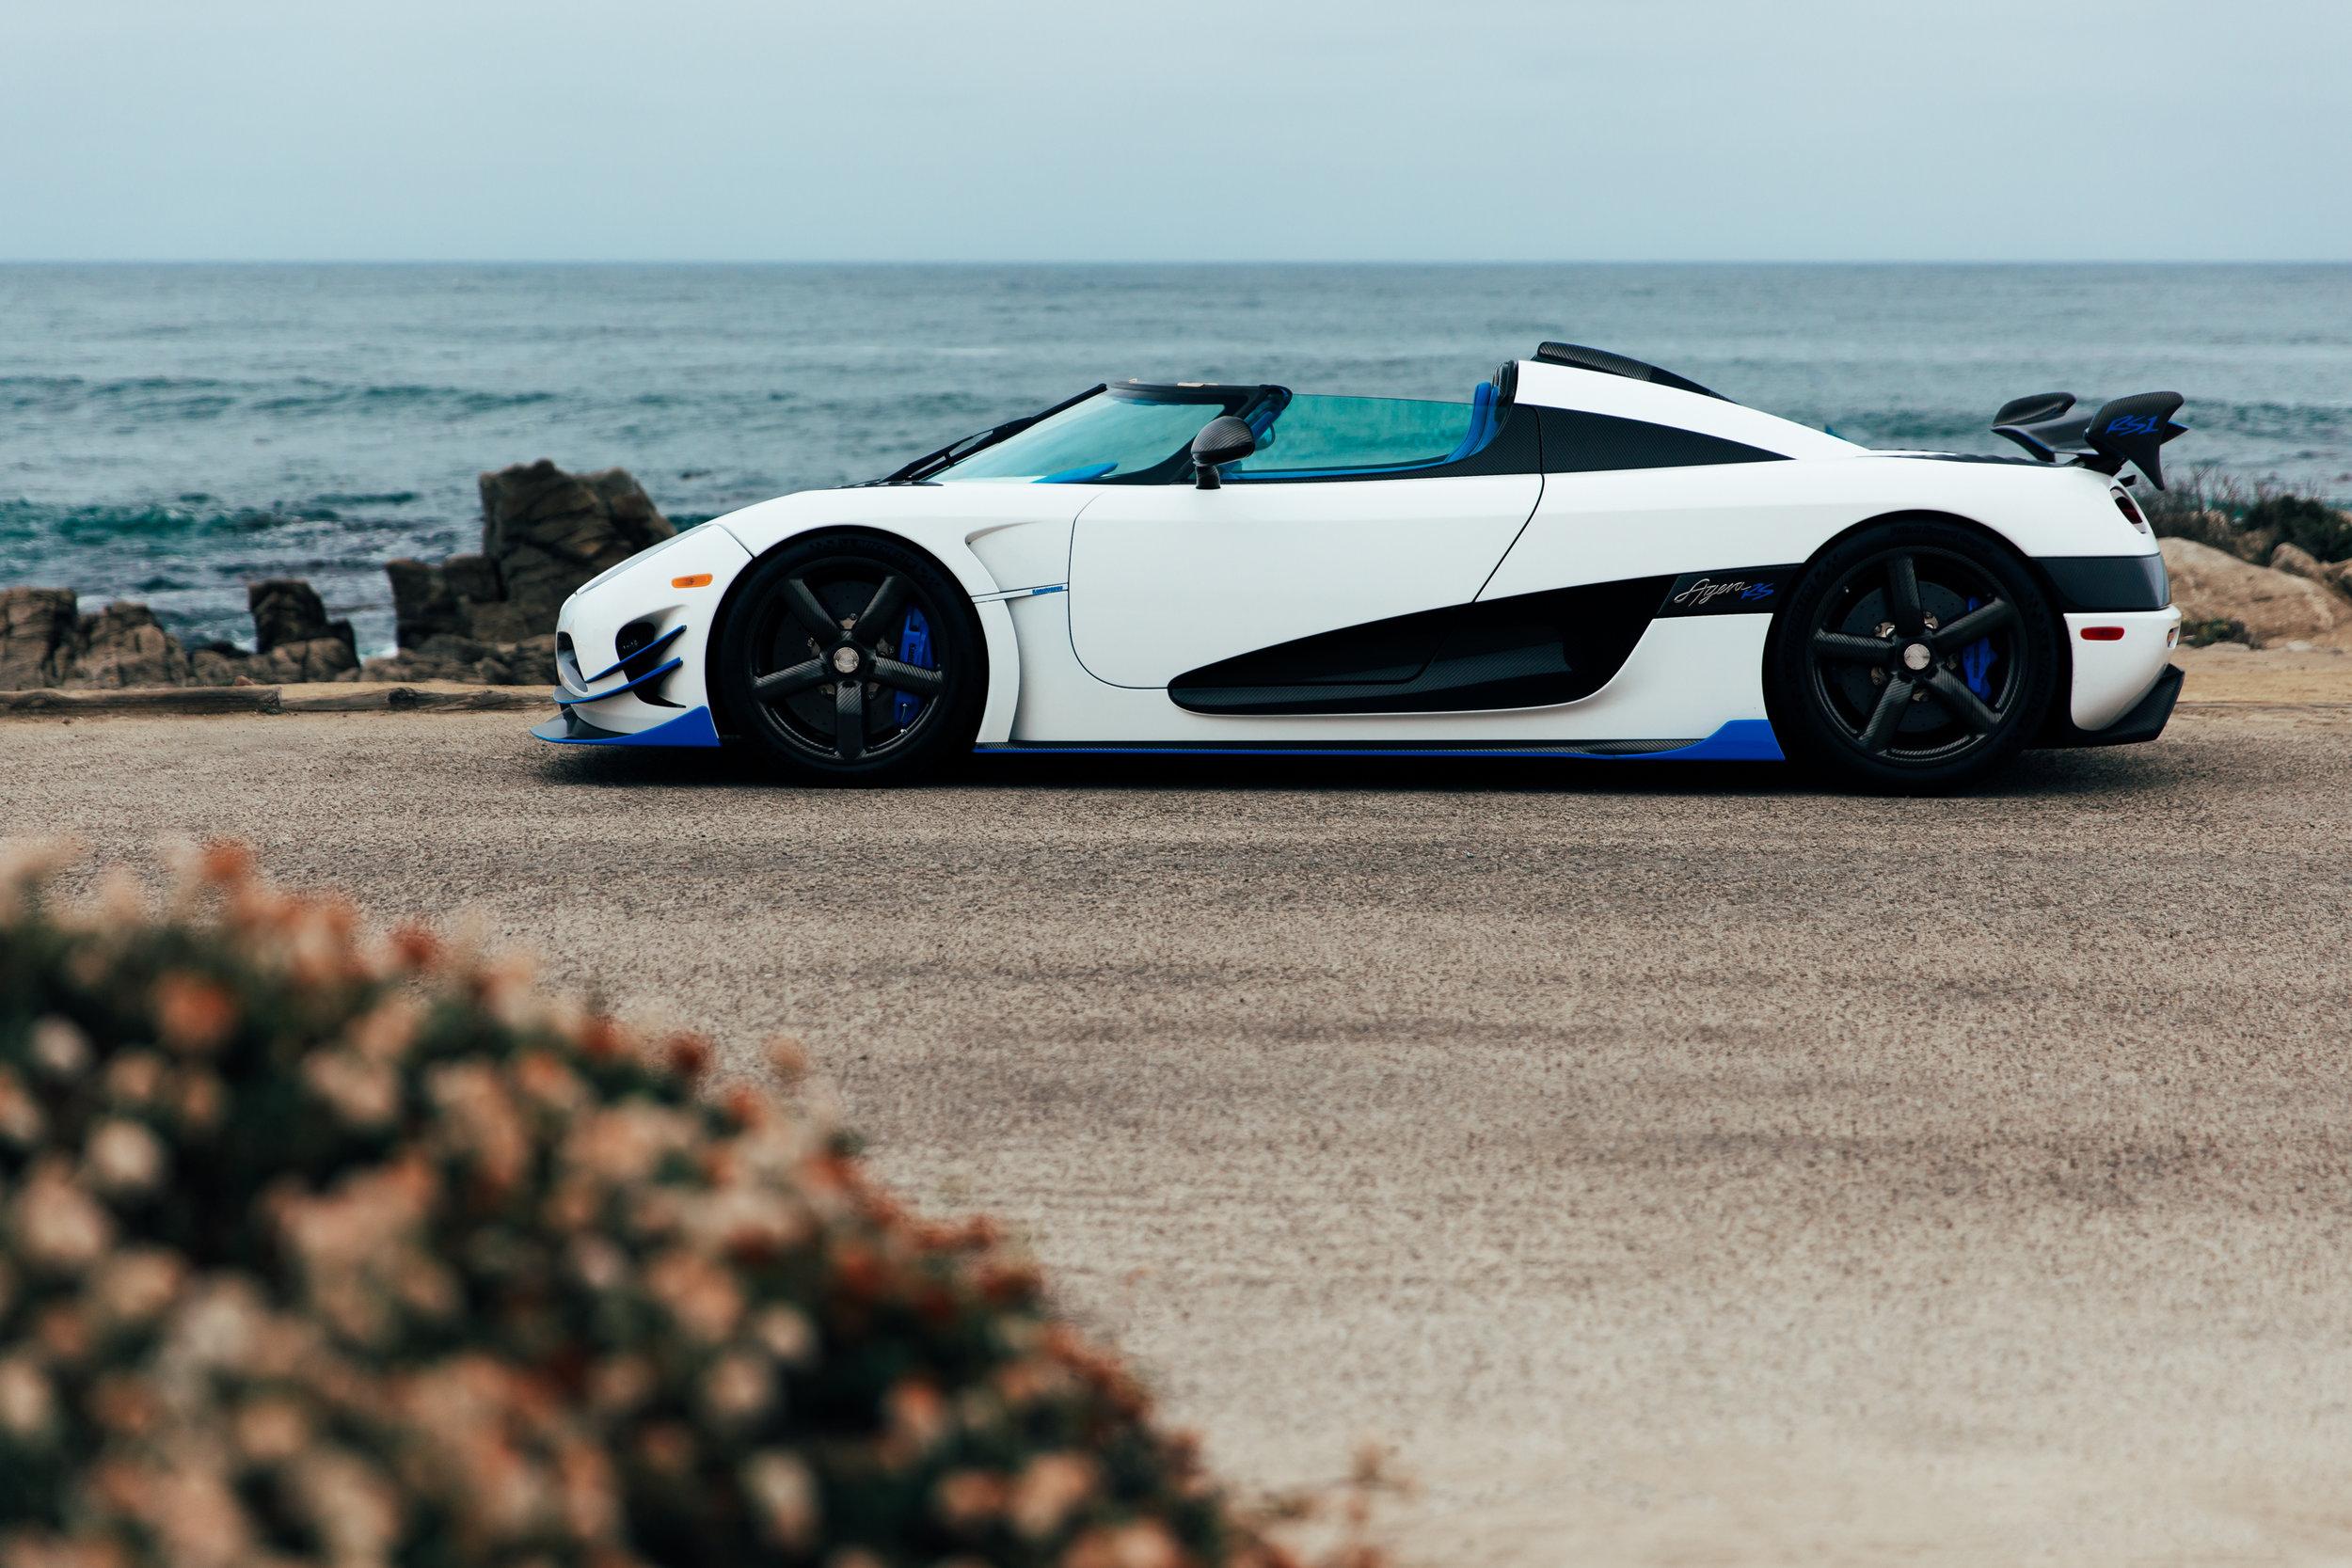 Stay_Driven_Monterey_Car_Week_Whitesse_Koenigsegg-20.jpg